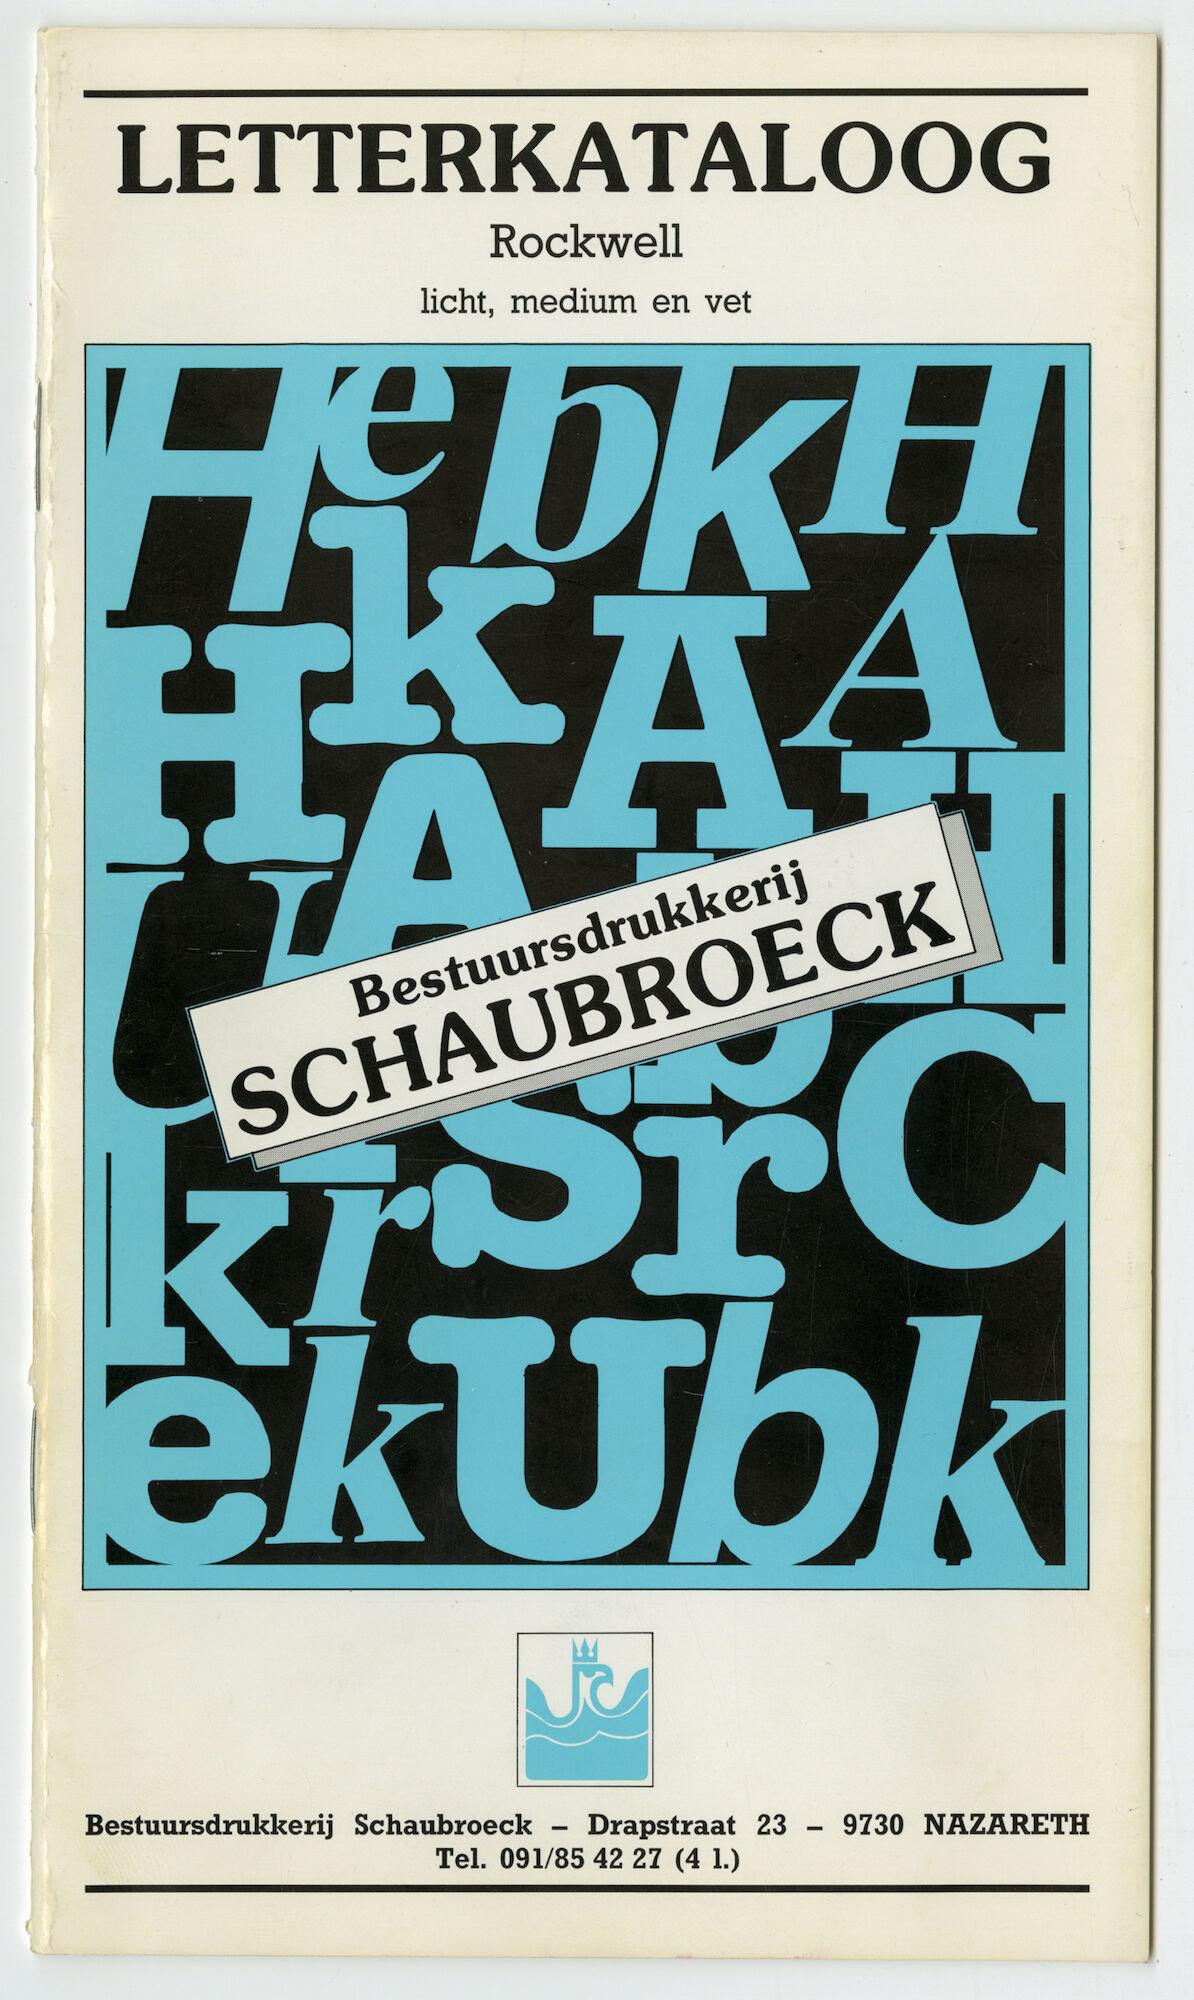 Letterproef met het lettertype Rockwell